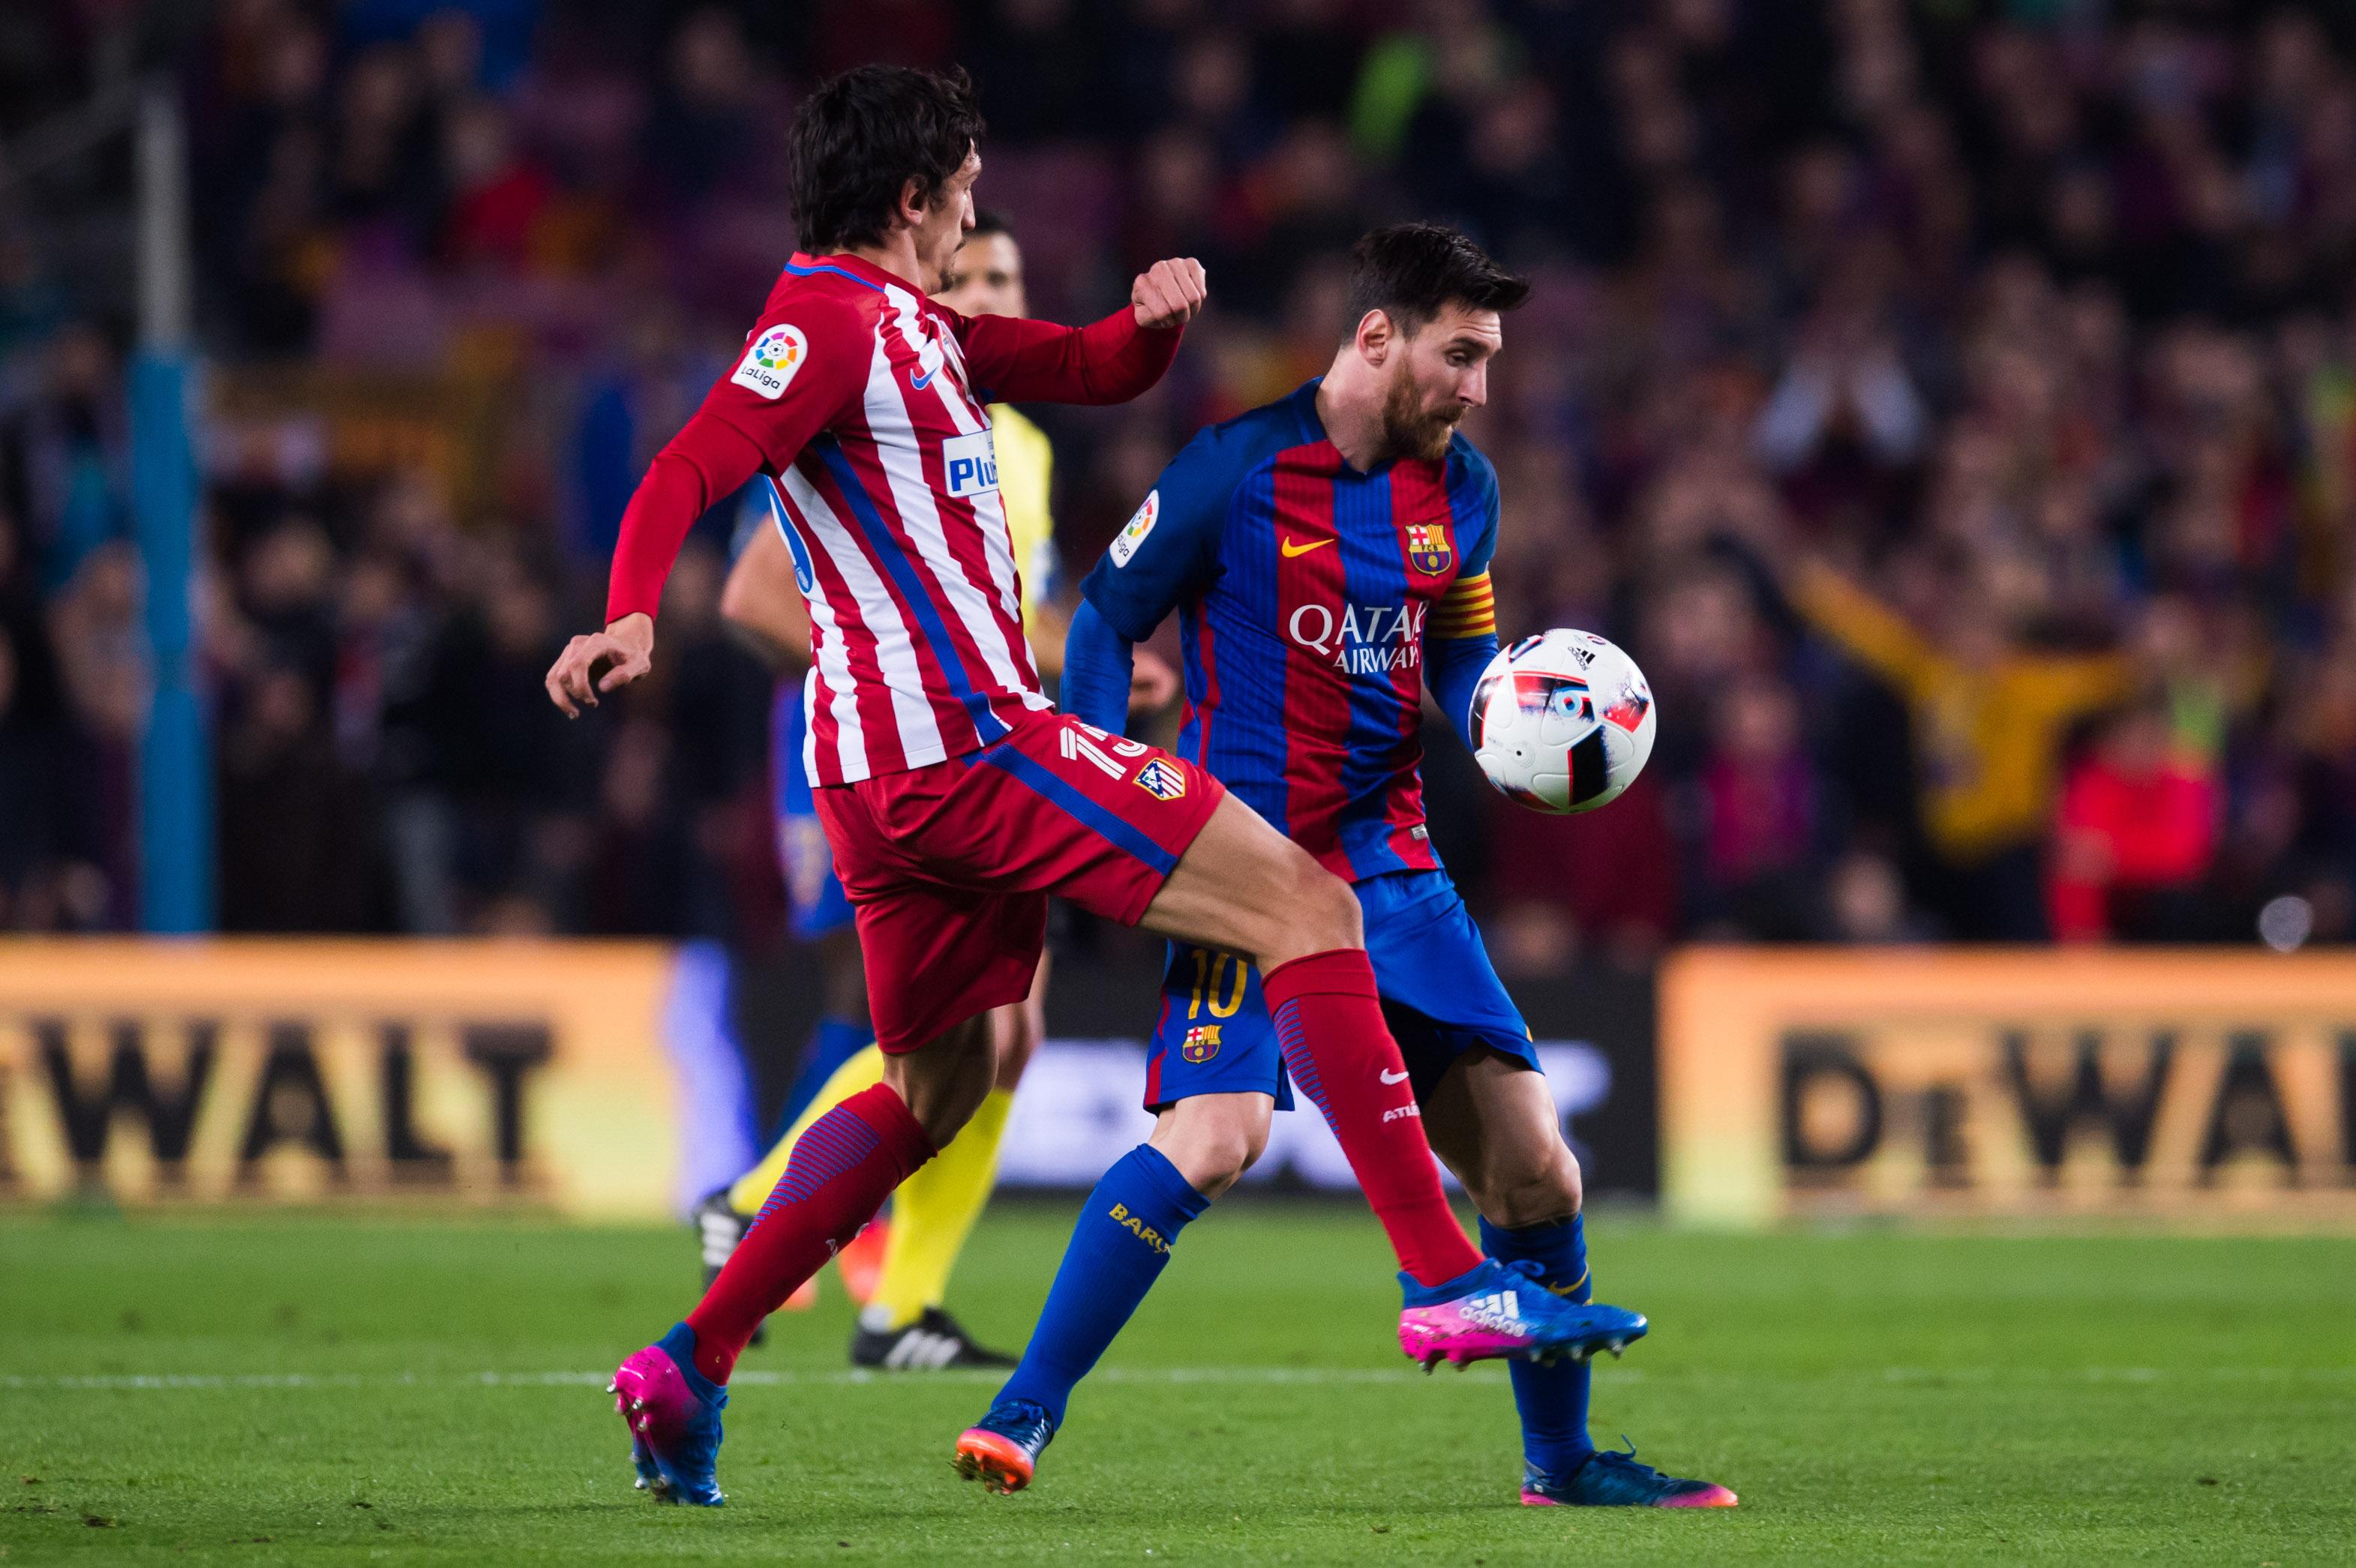 Барселона - Атлетико Мадрид